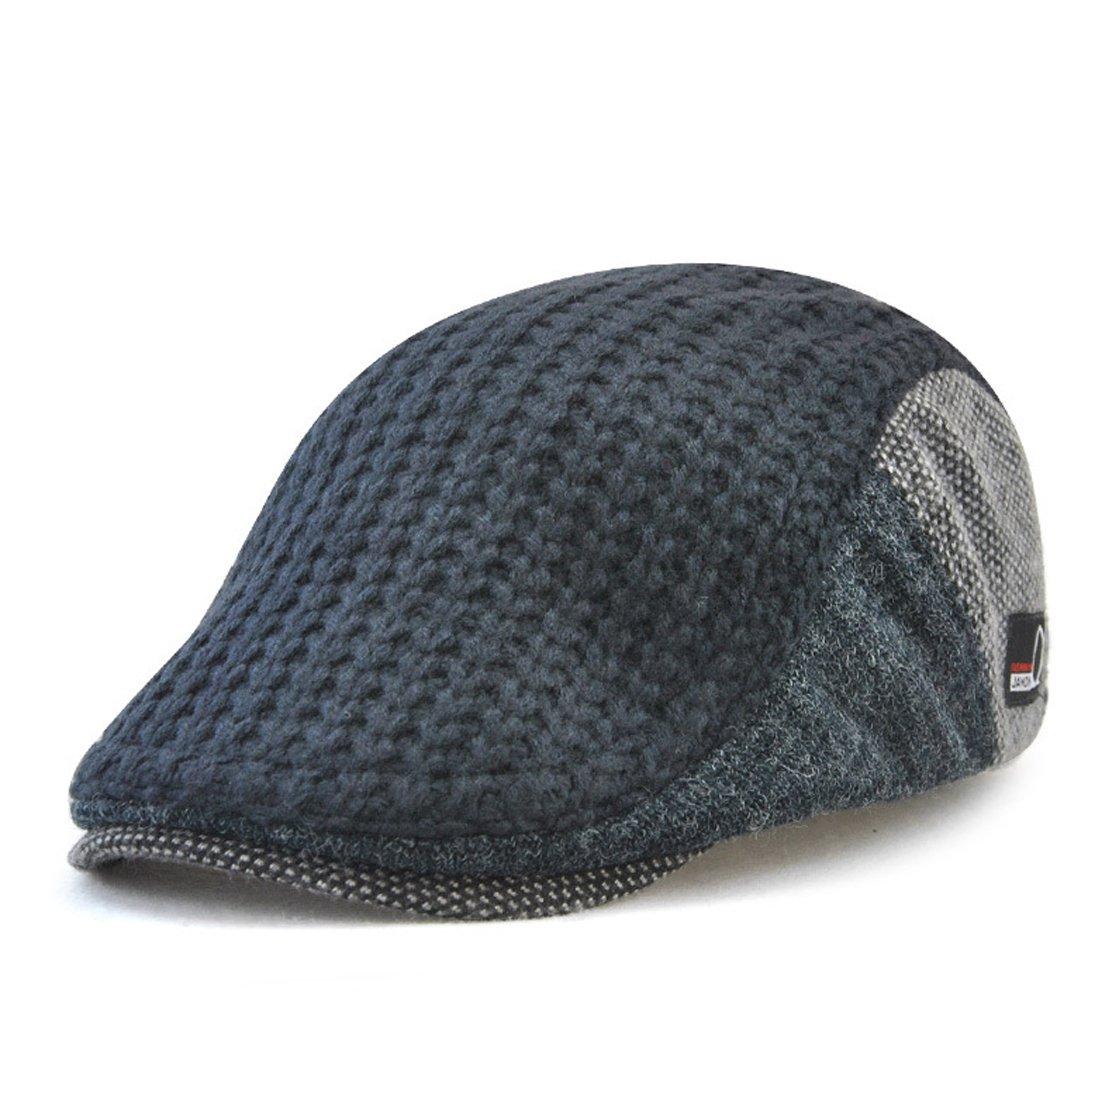 King Star Men's Knitted Wool Duckbill Hat Warm Newsboy Flat Scally Cap H8288-1